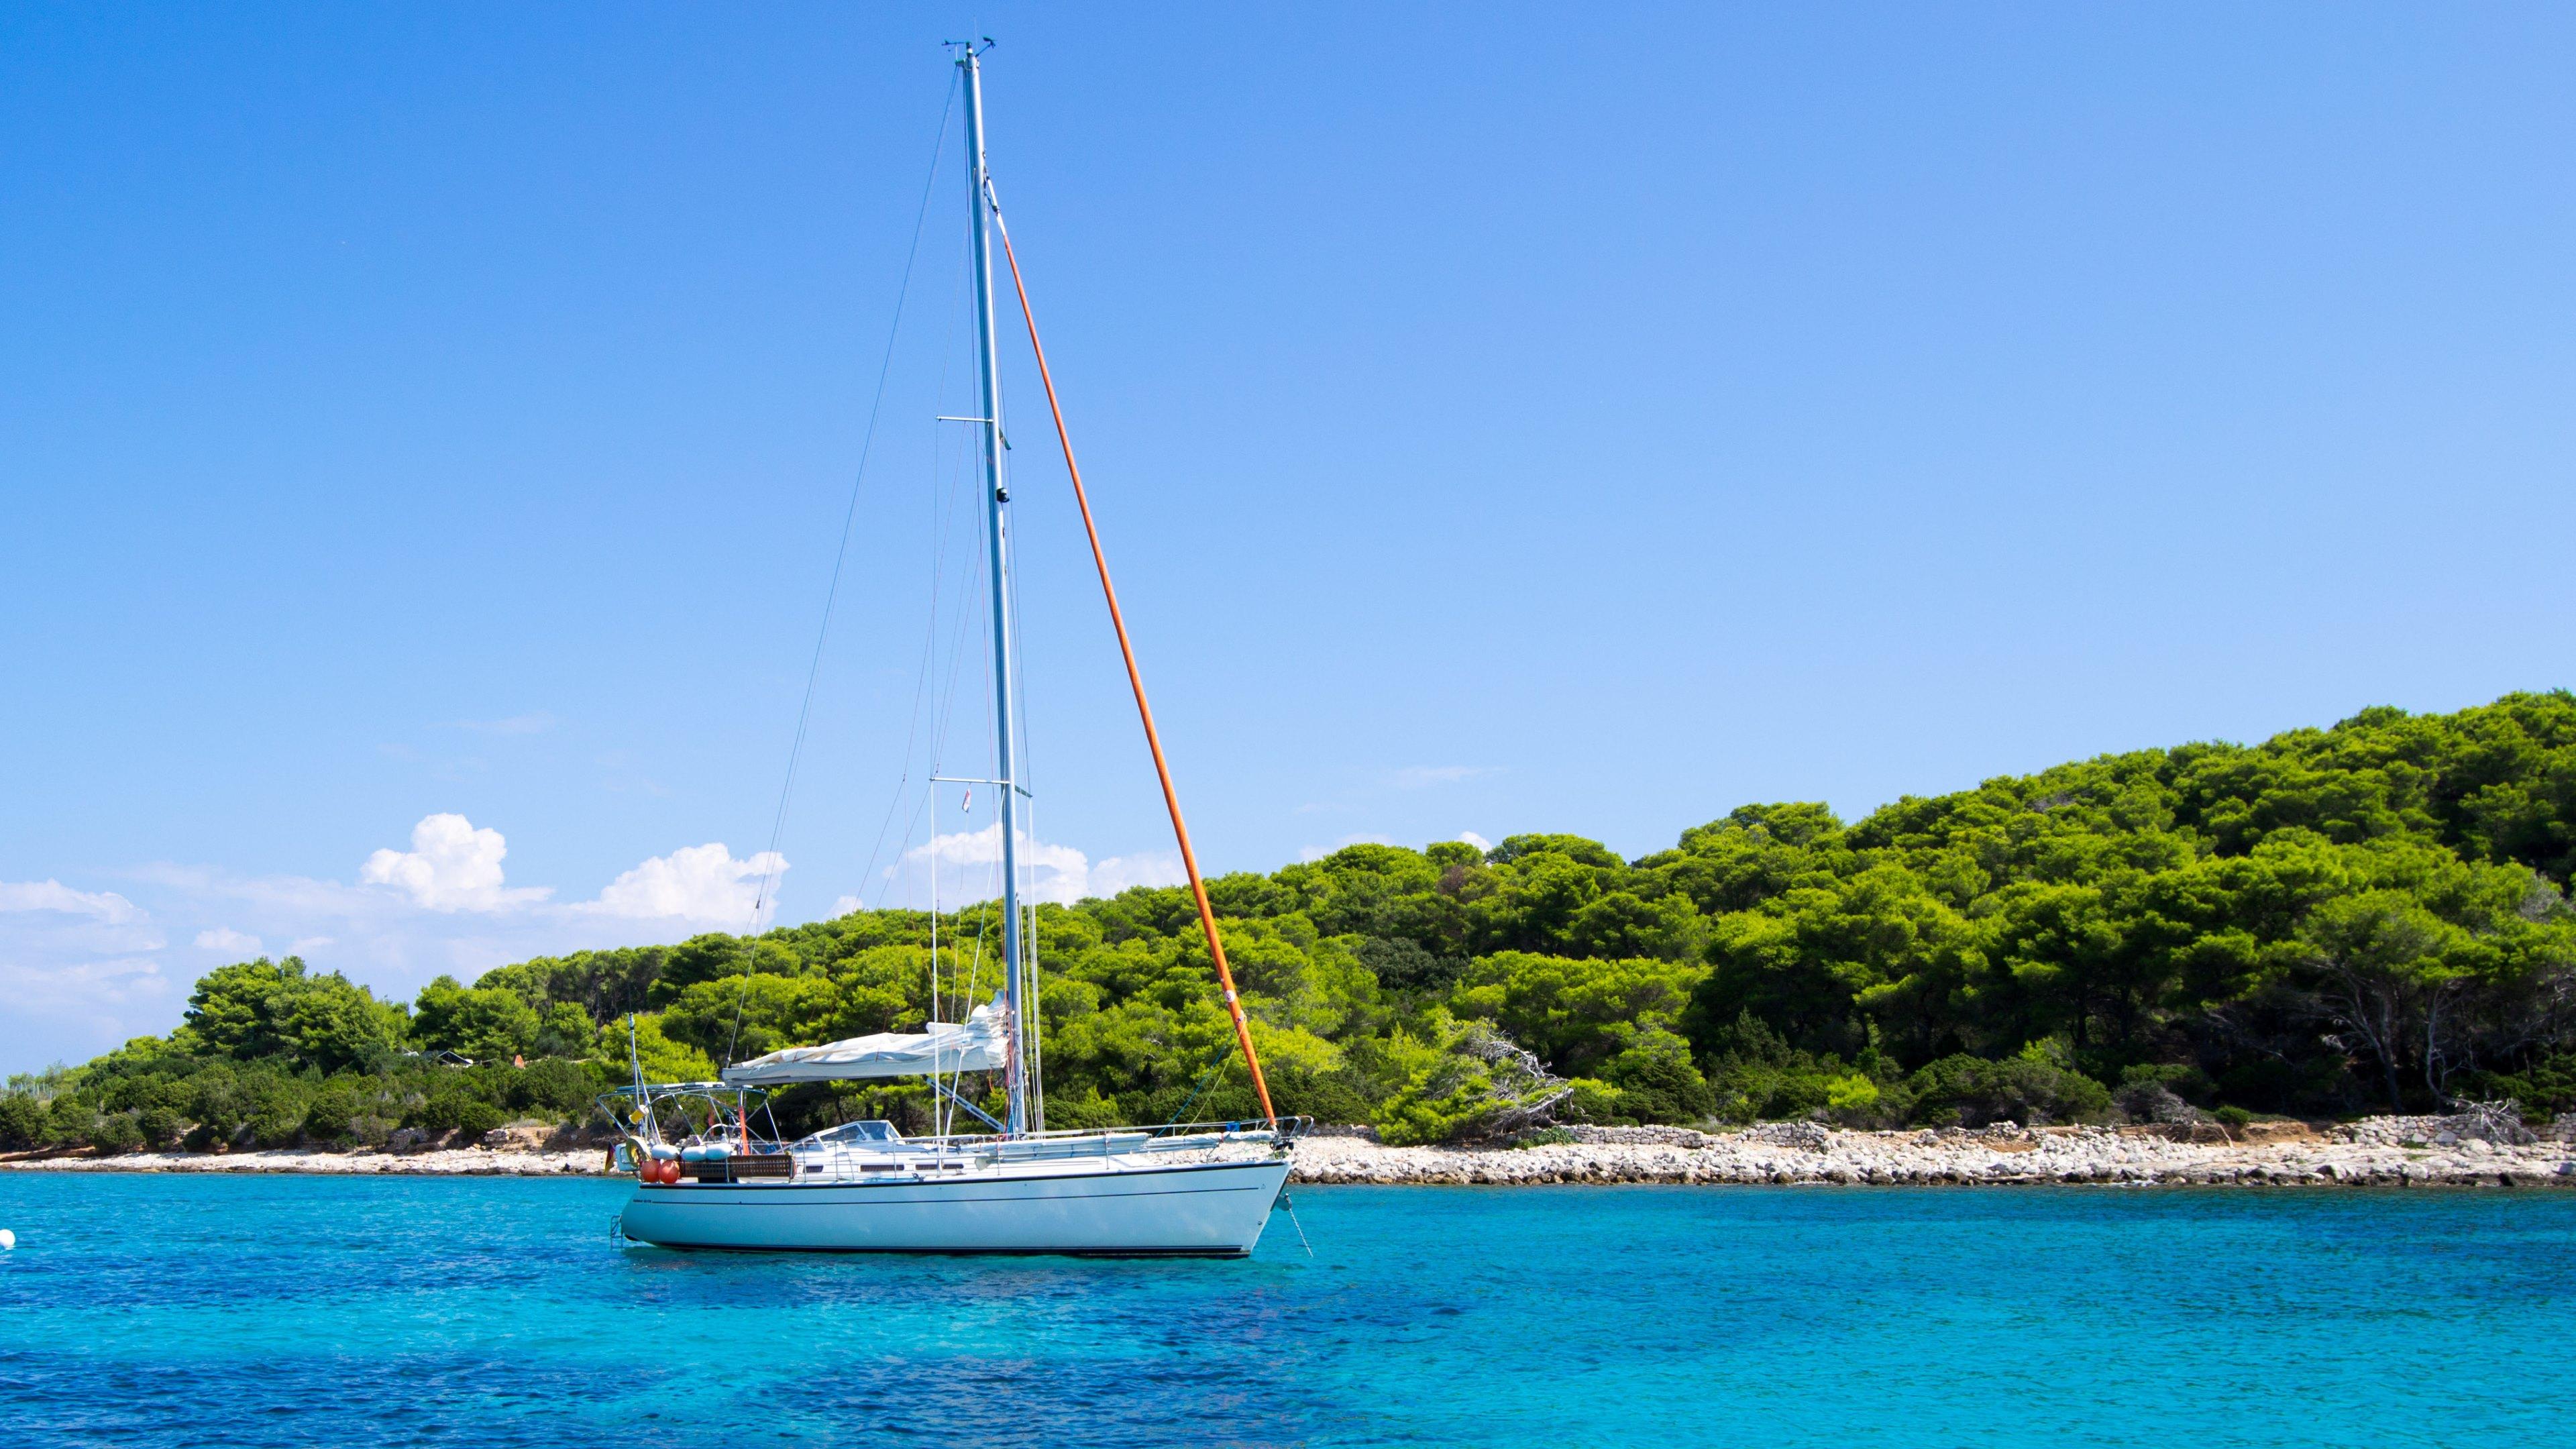 sailboat travel widescreen wallpaper 51561